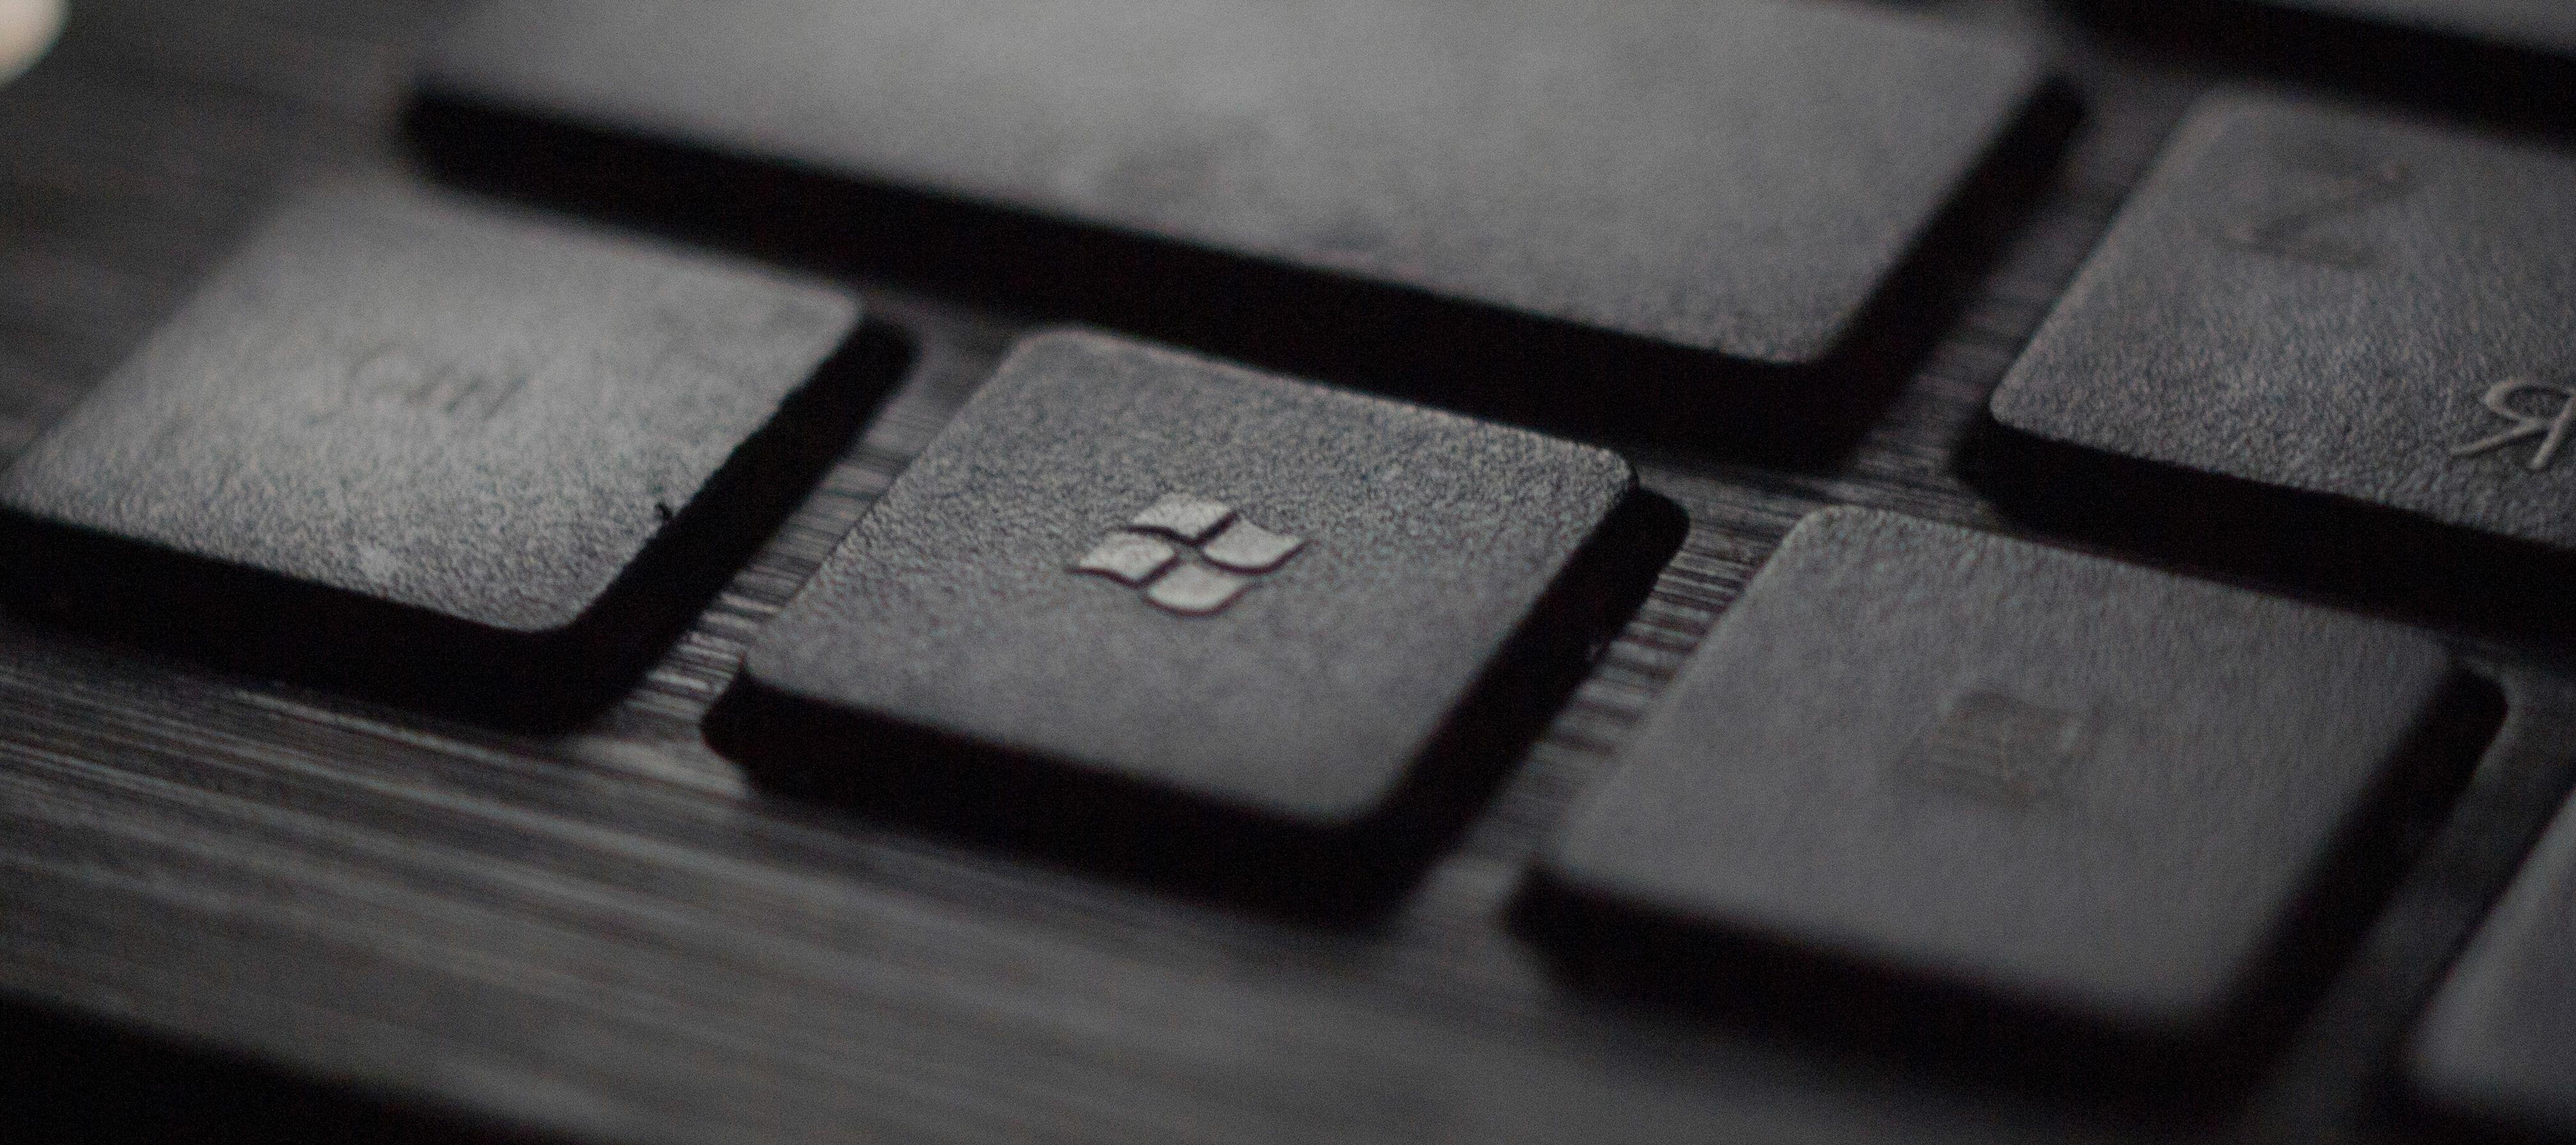 Das Microsoft Surface Pro X jetzt bei o2!